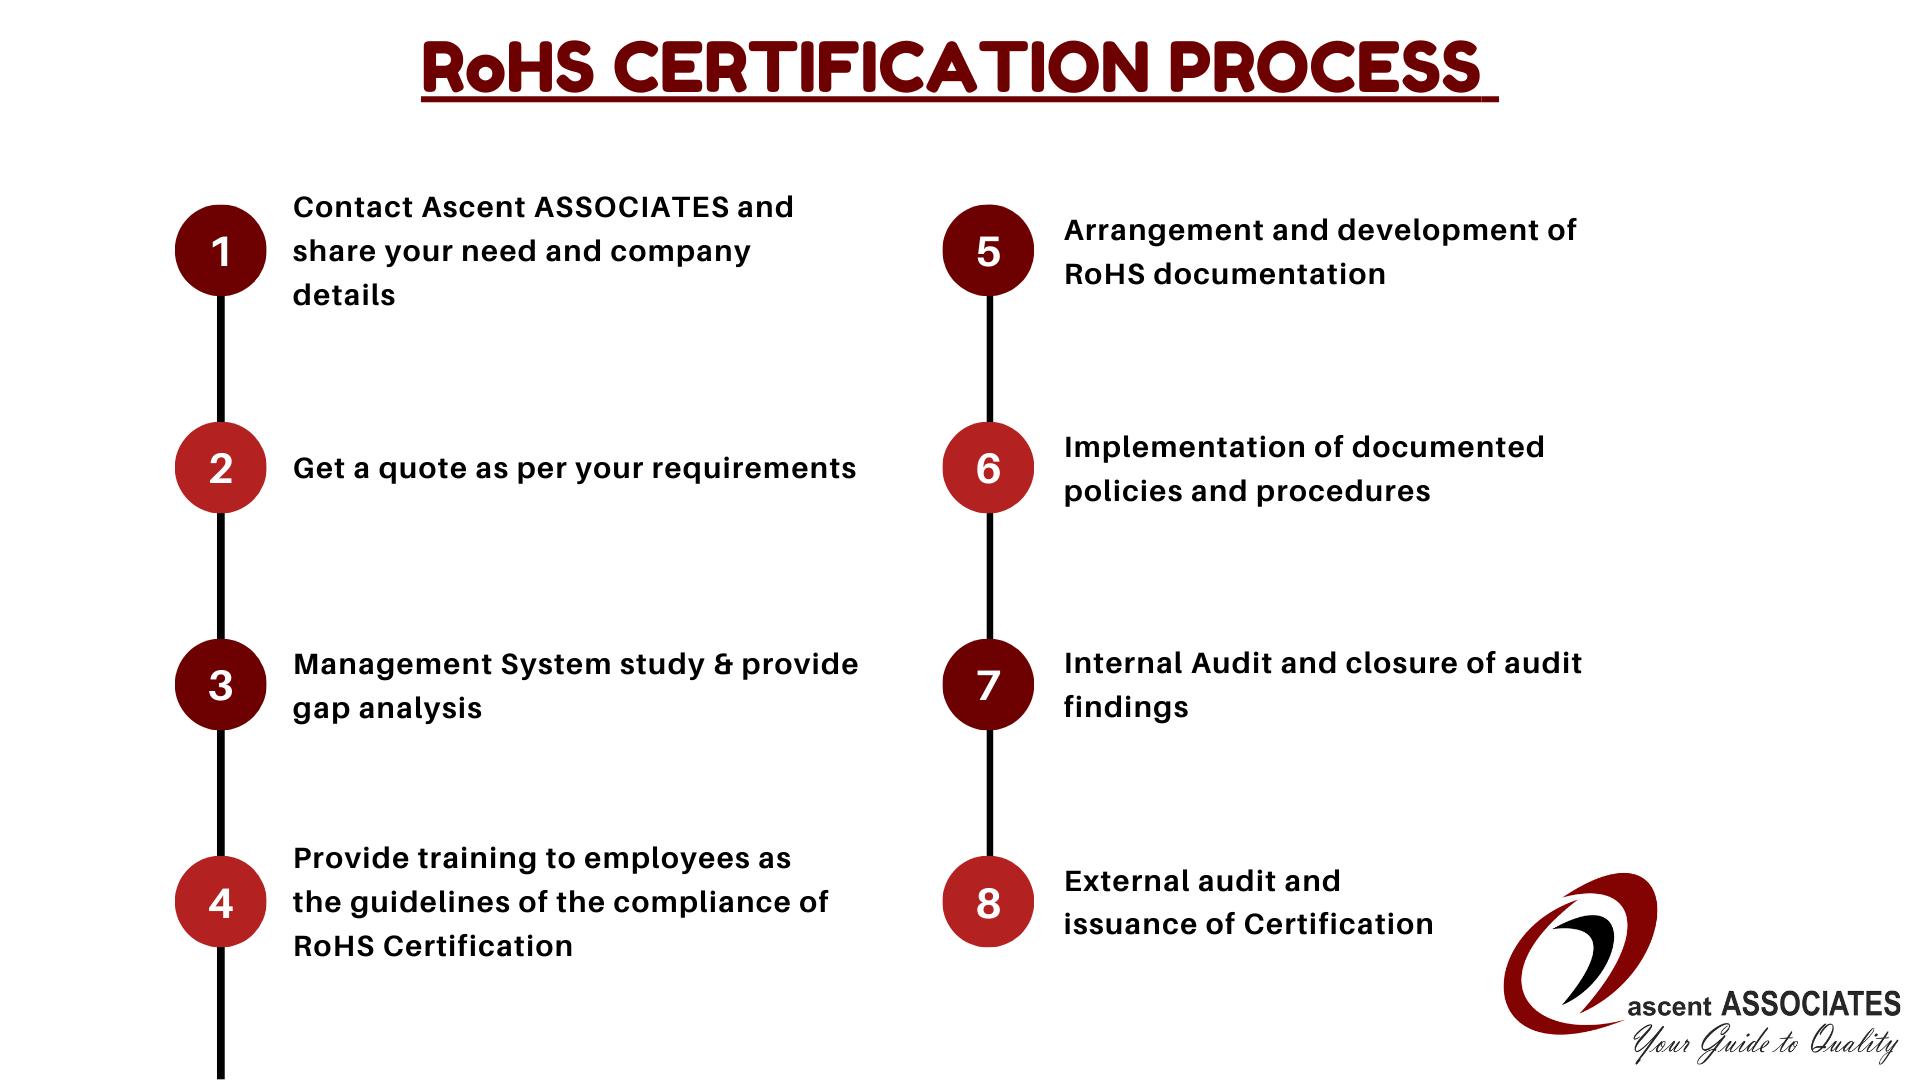 RoHS Certification process in Sri Lanka